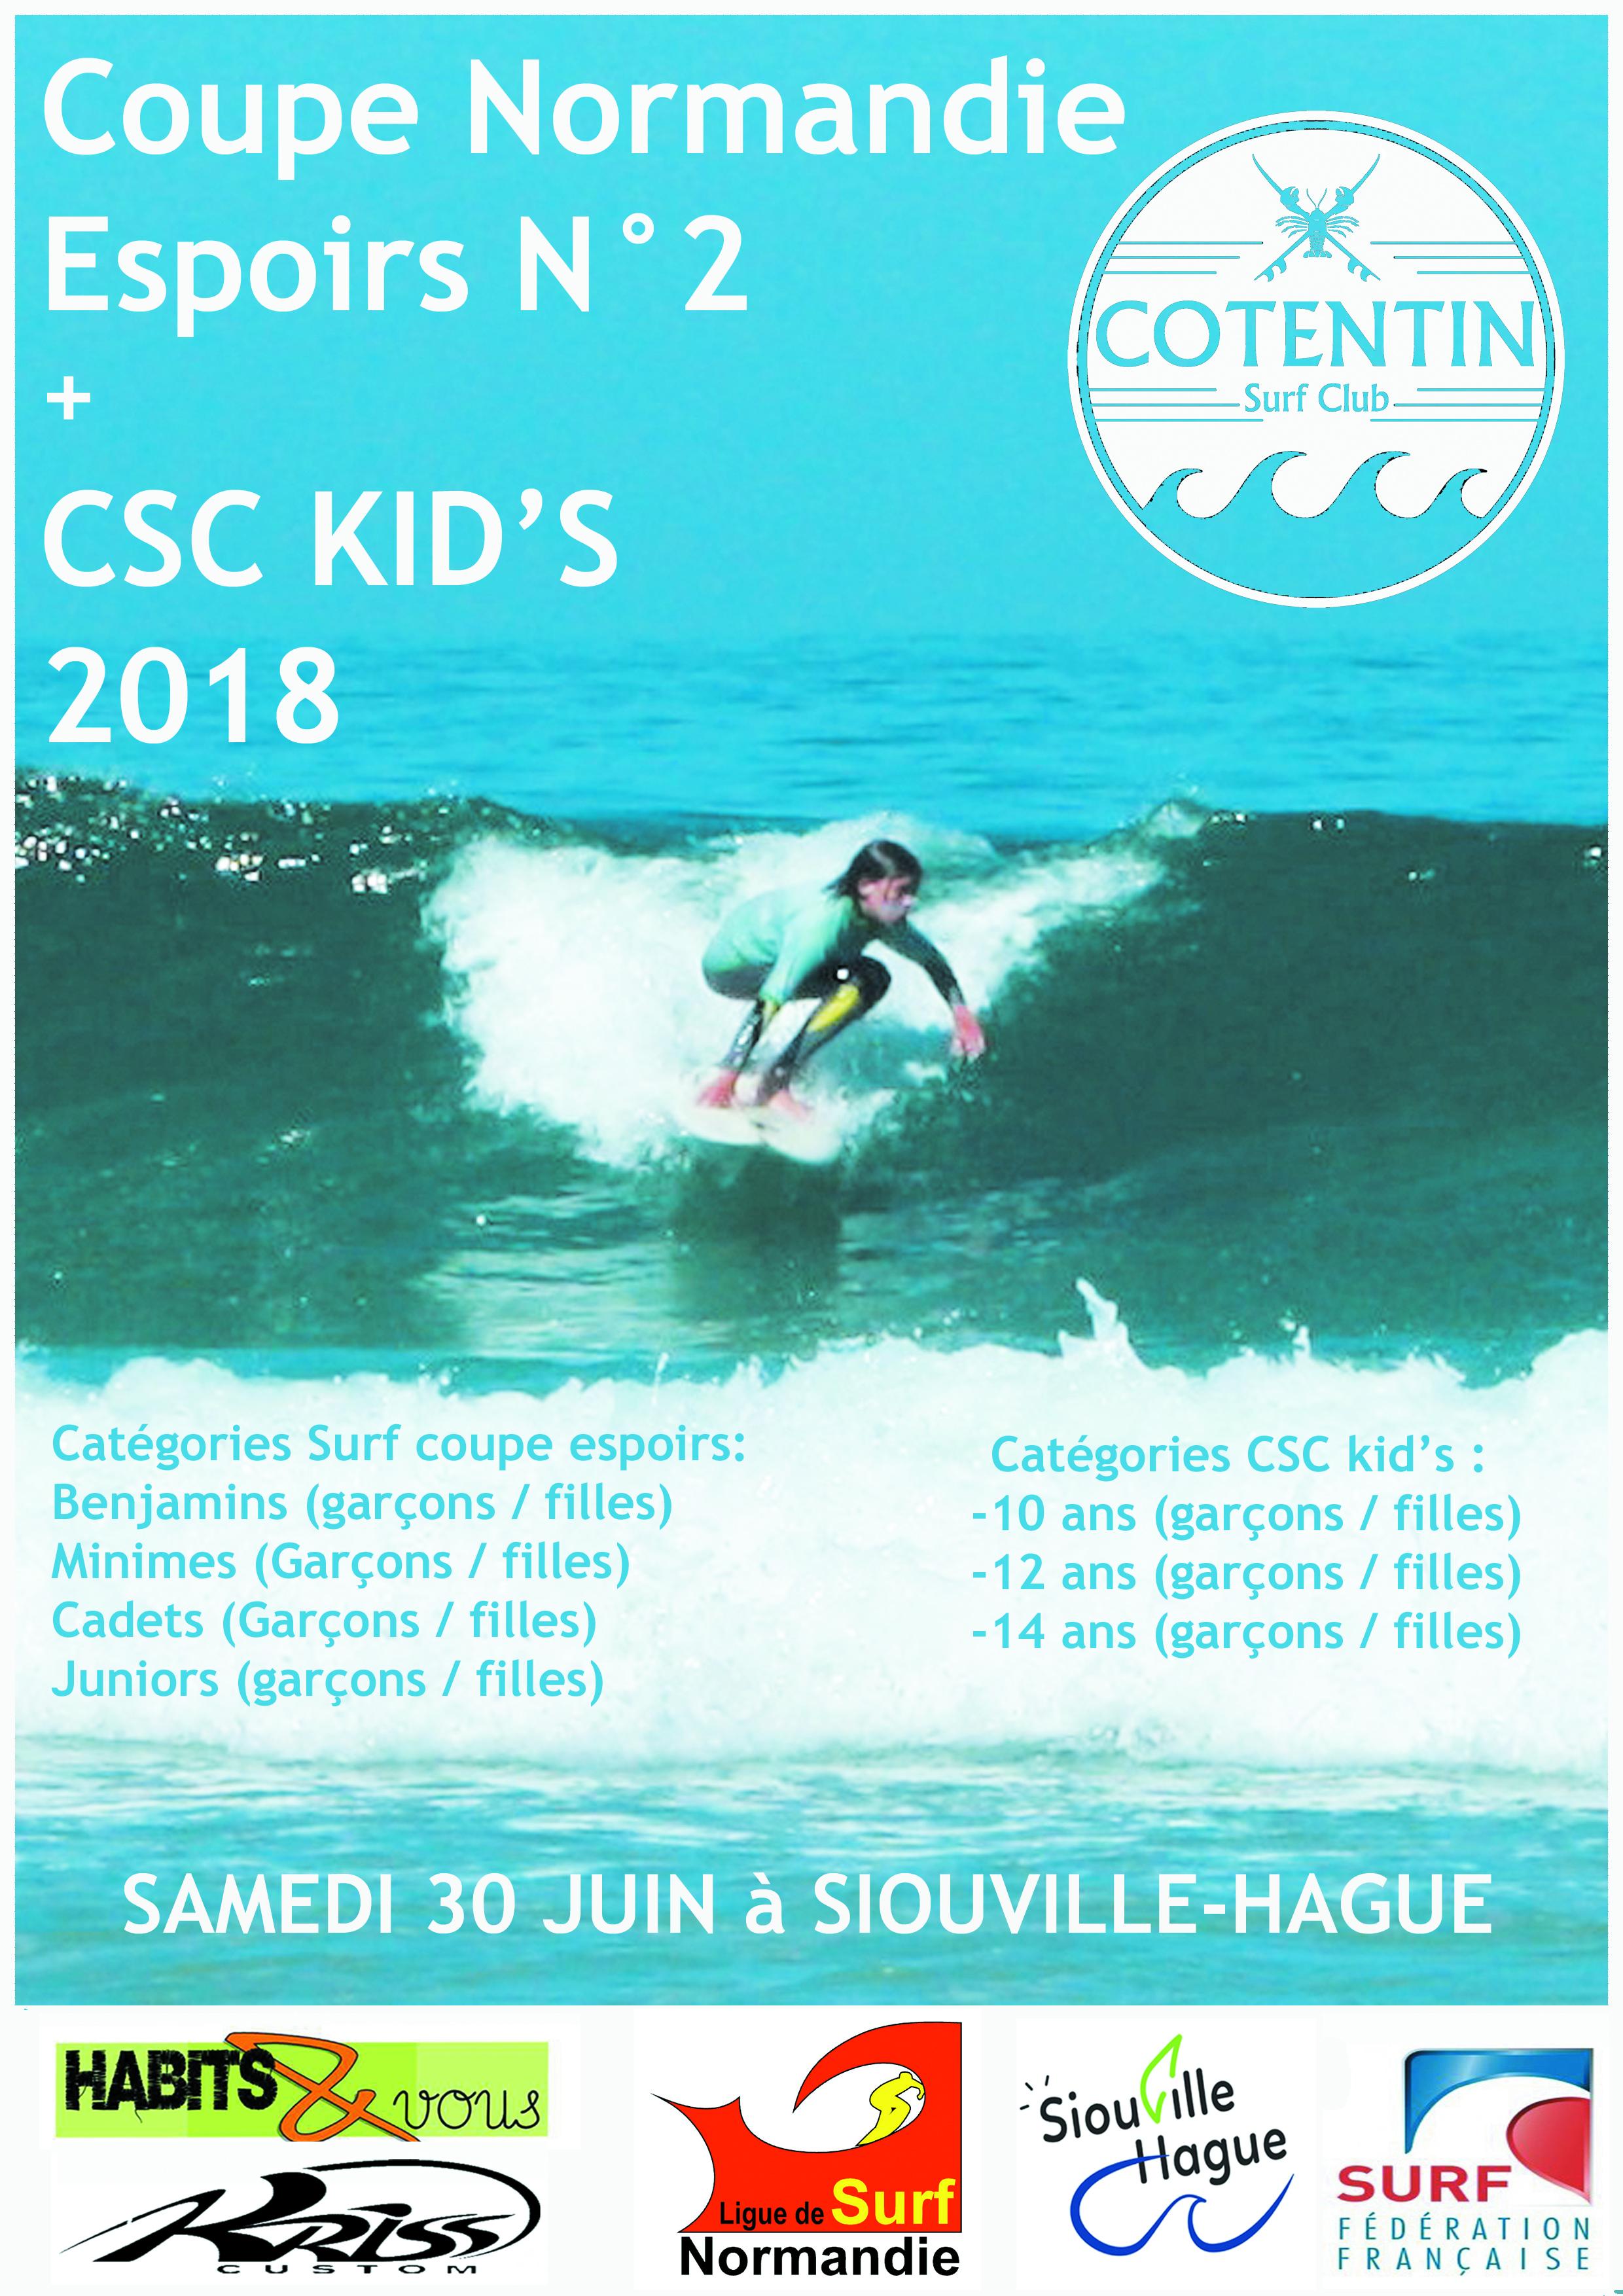 Coupe surf Normandie espoirs N°2 SAmedi 30 Juin